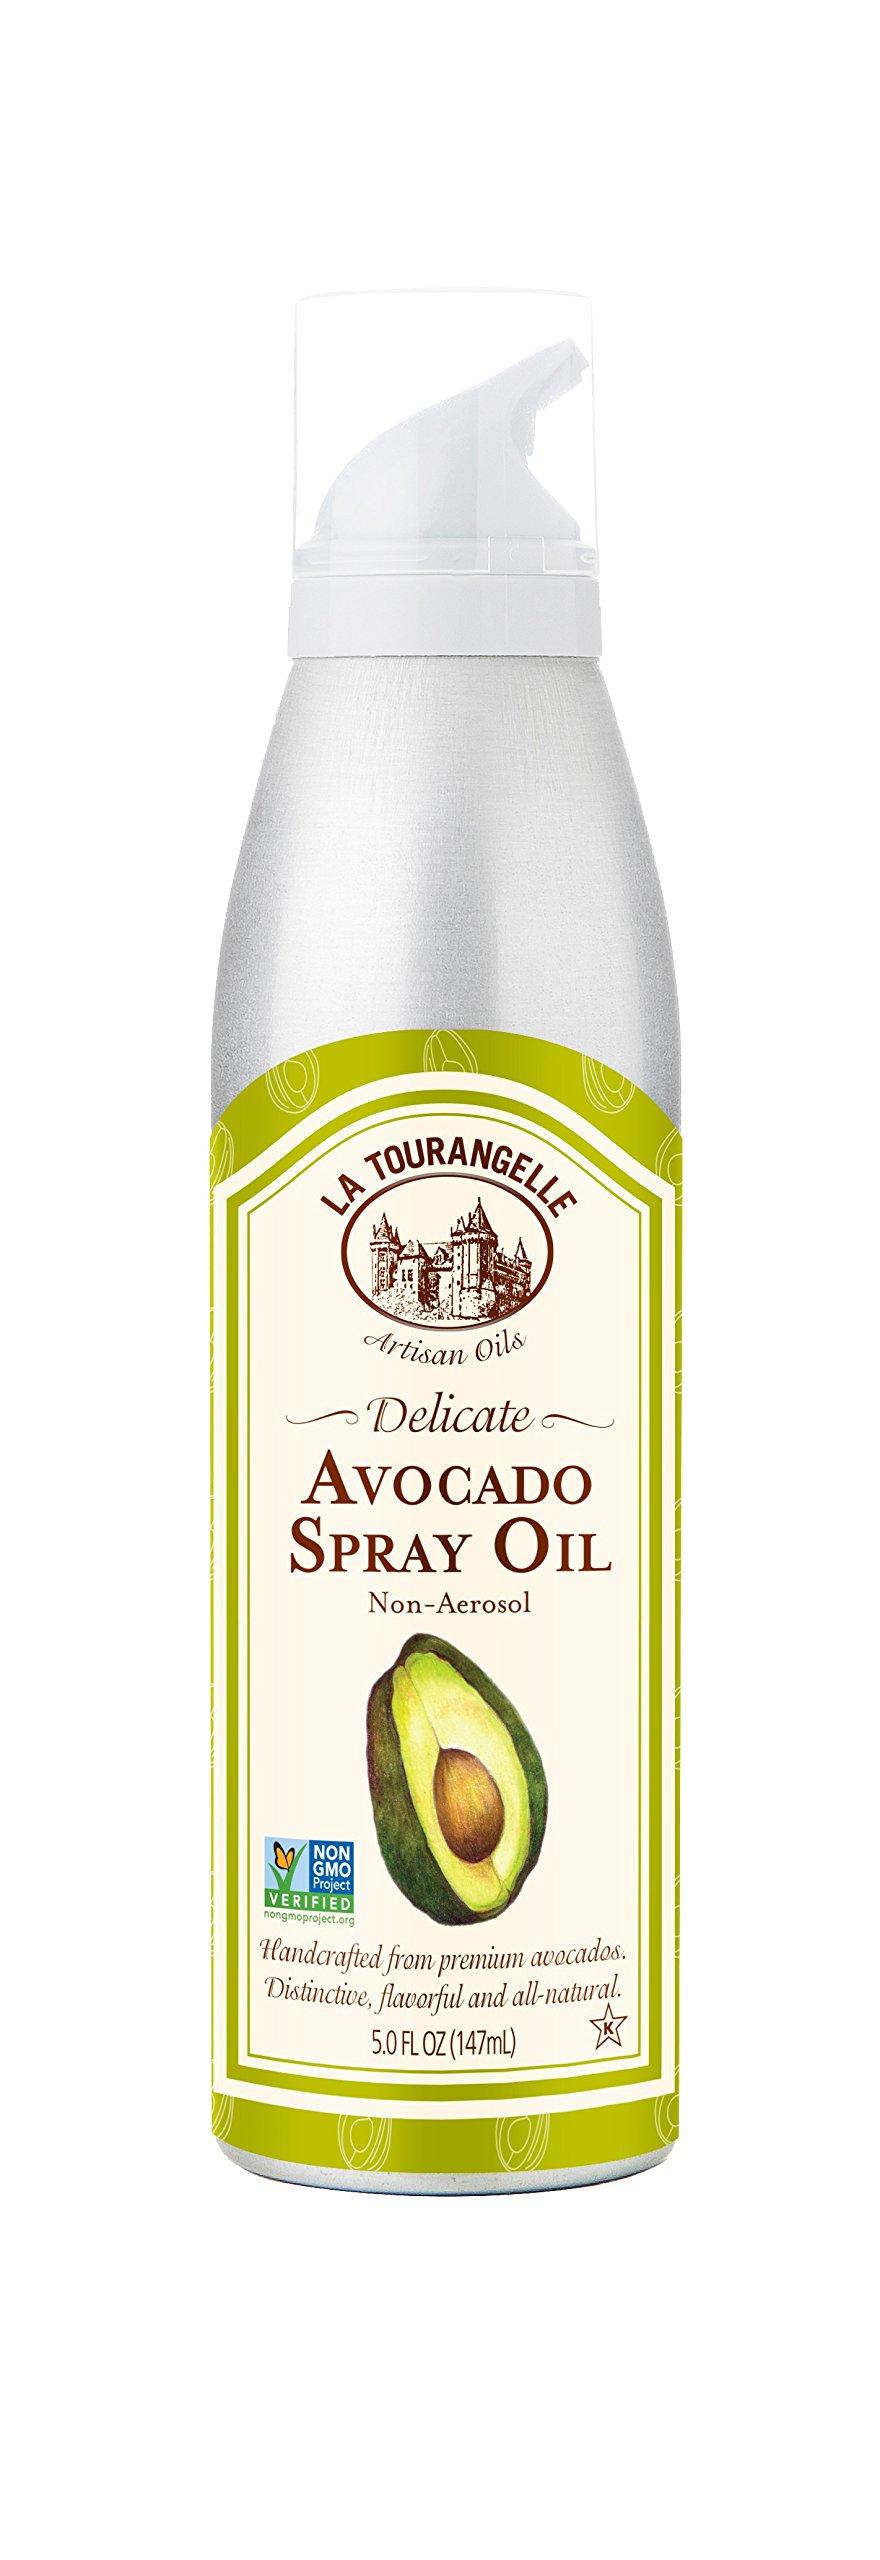 La Tourangelle Avocado Oil Spray 5 Fl. Oz., All-Natural, Artisanal, Great for Salads, Fruit, Fish or Vegetables, Great Buttery Flavor, Green (40-05-AVO-0005-CS)